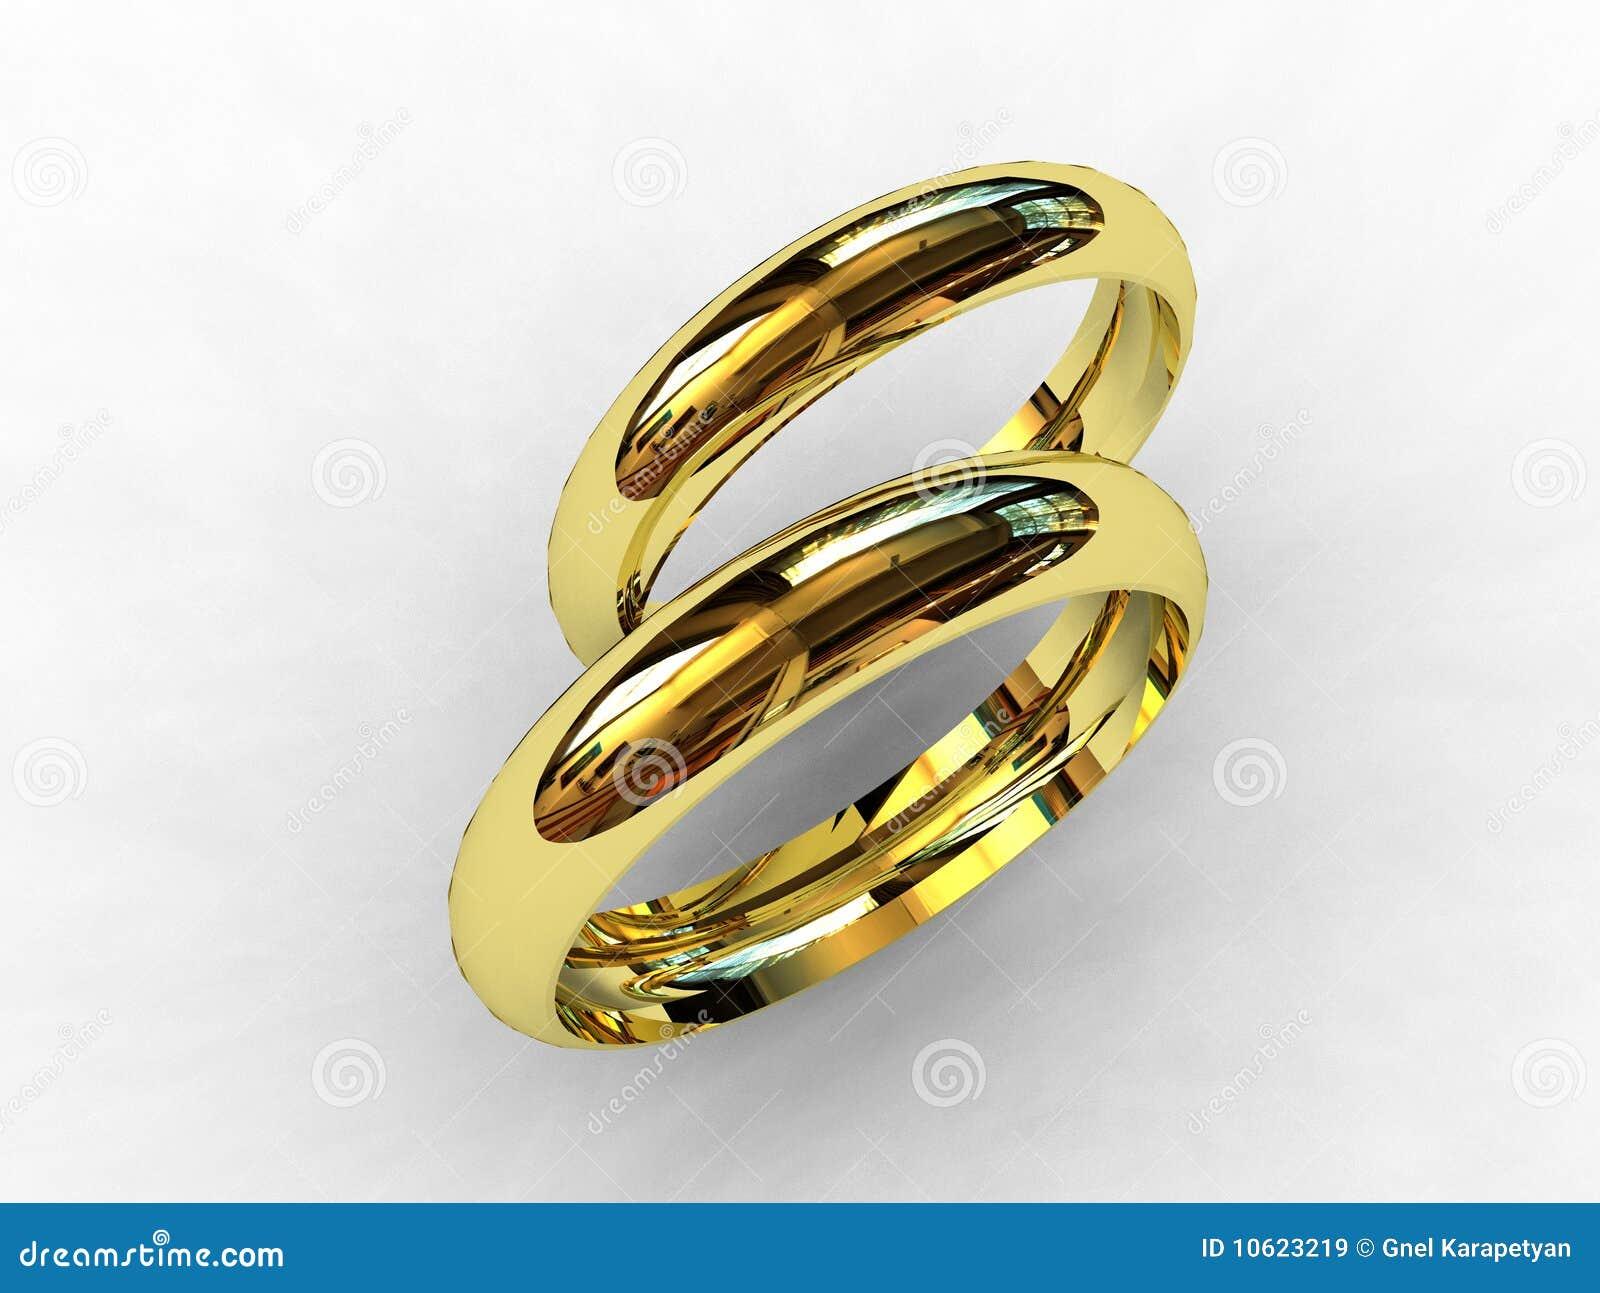 18 Karat Gold Wedding Bands Royalty Free Stock Images ...